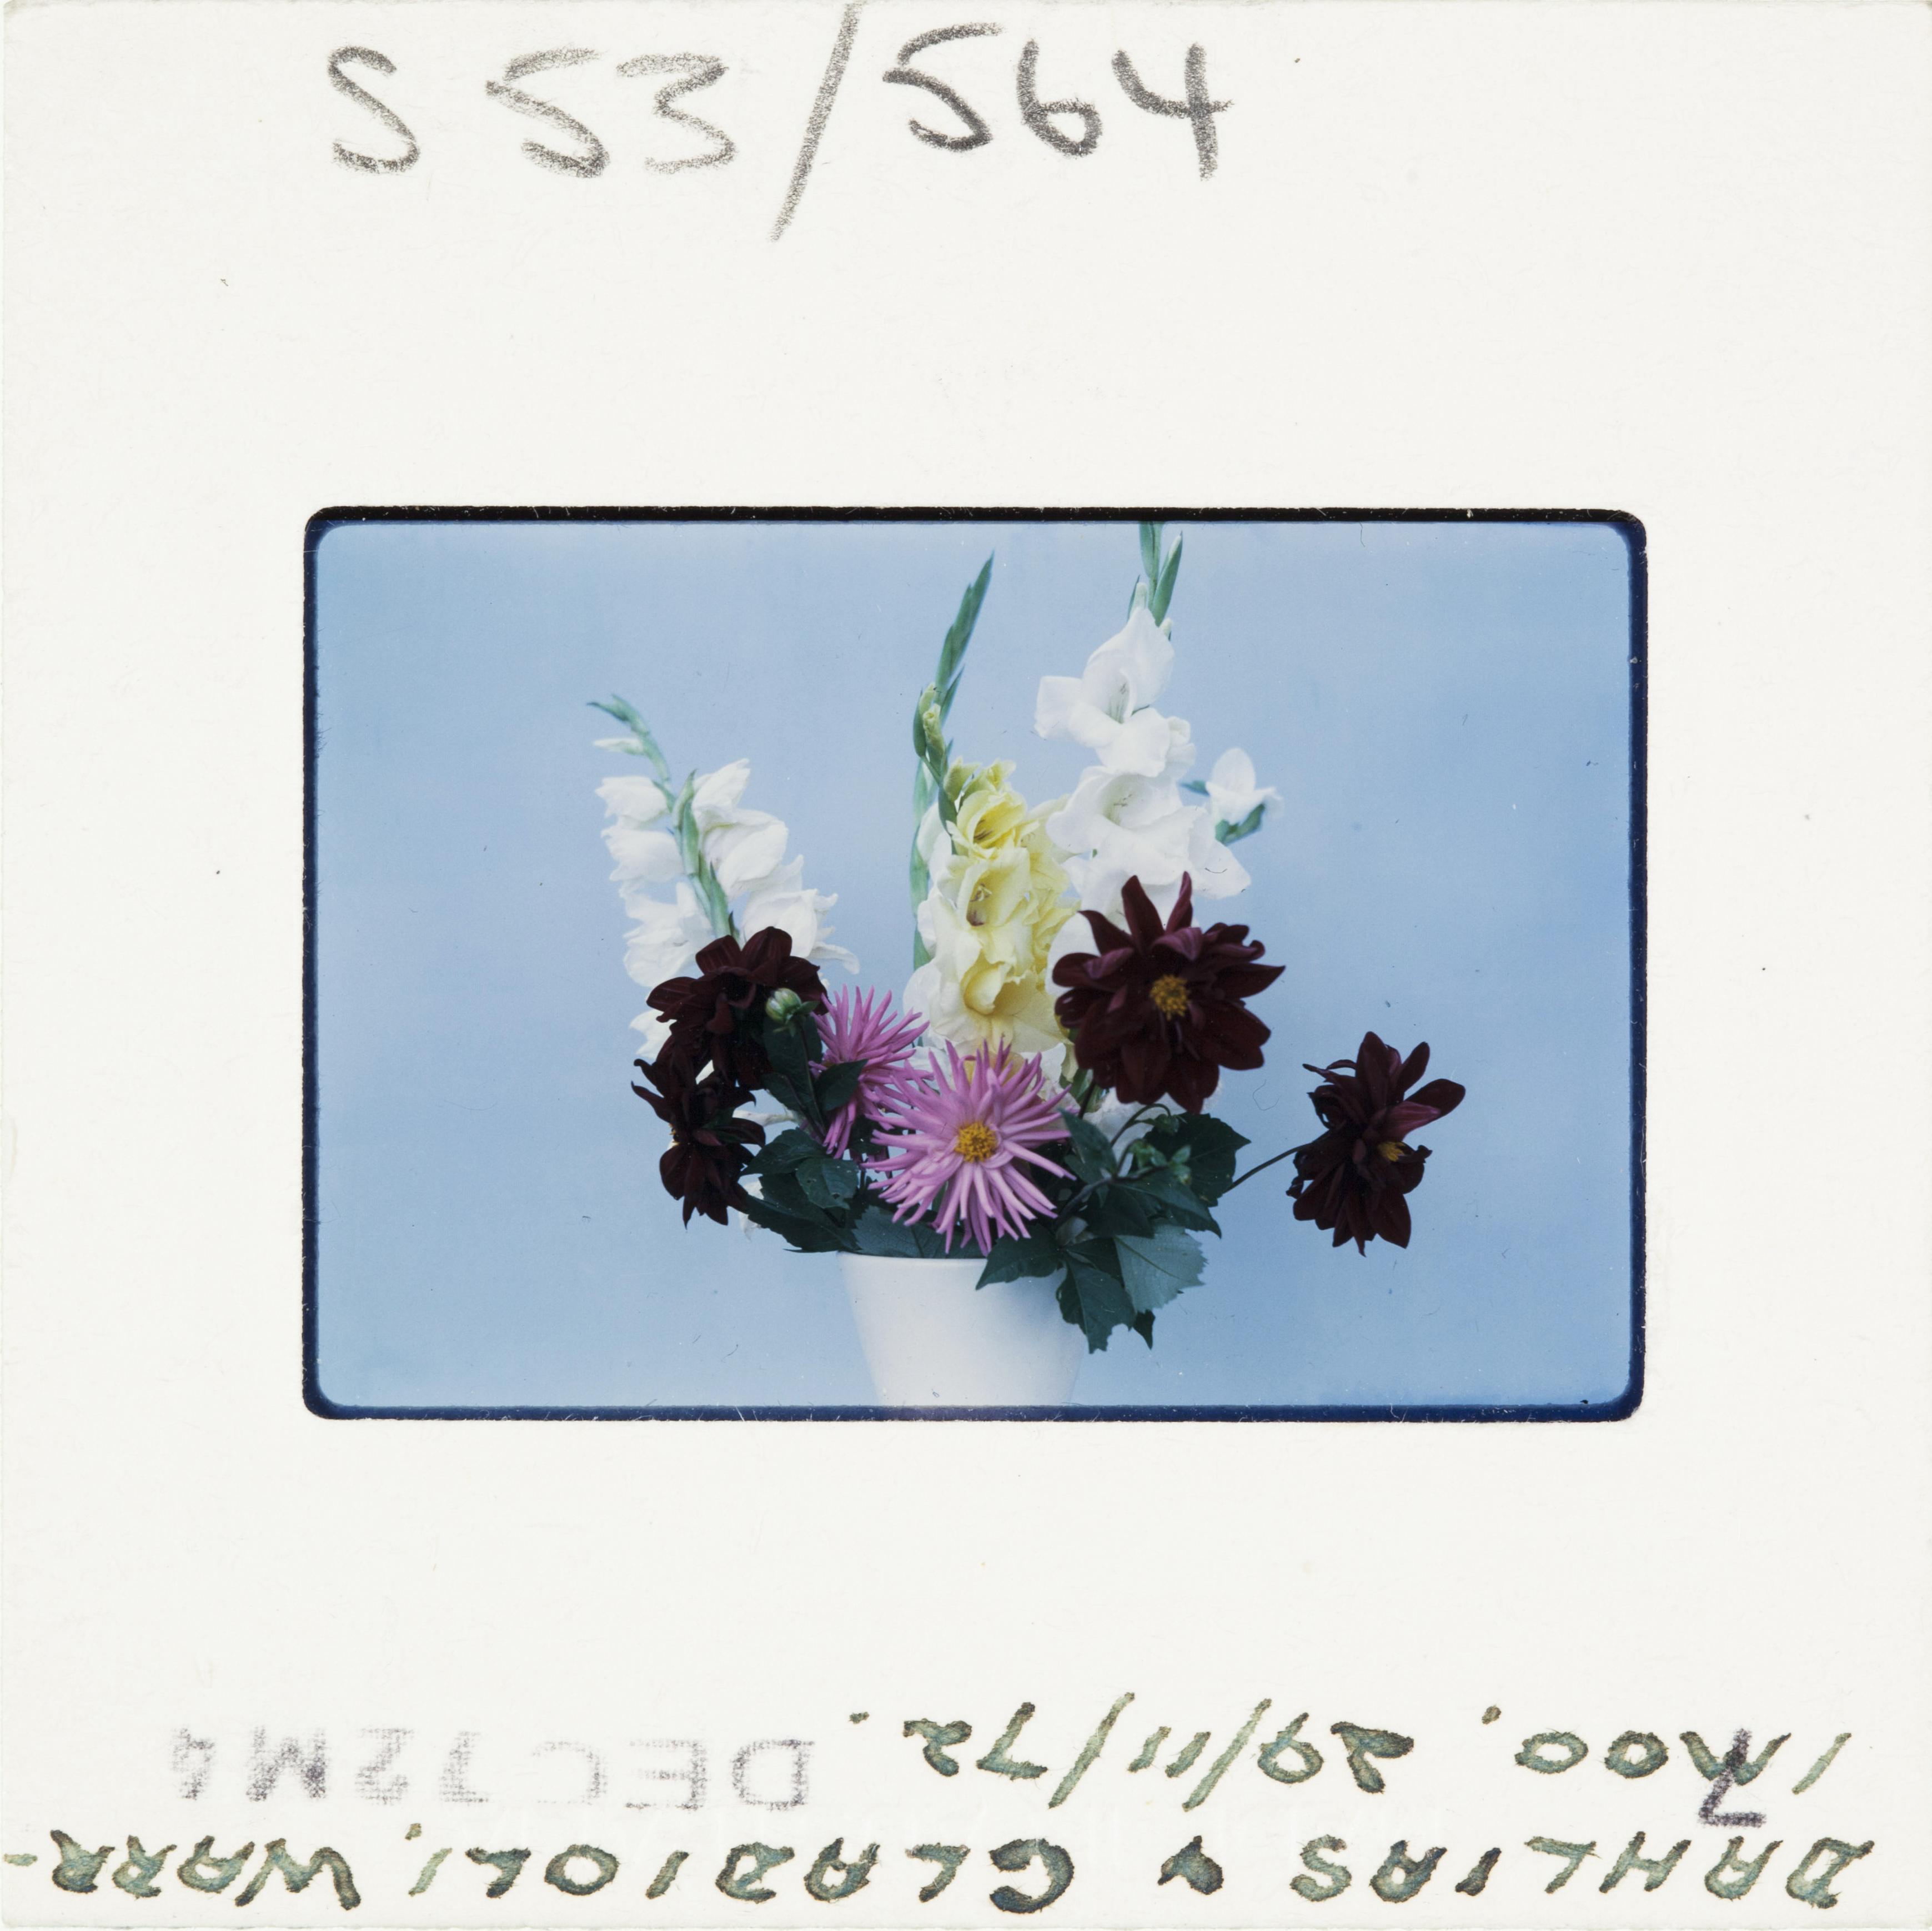 A colour Kodak slide dated 1972 - a vase of flowers against an egg shell blue background.